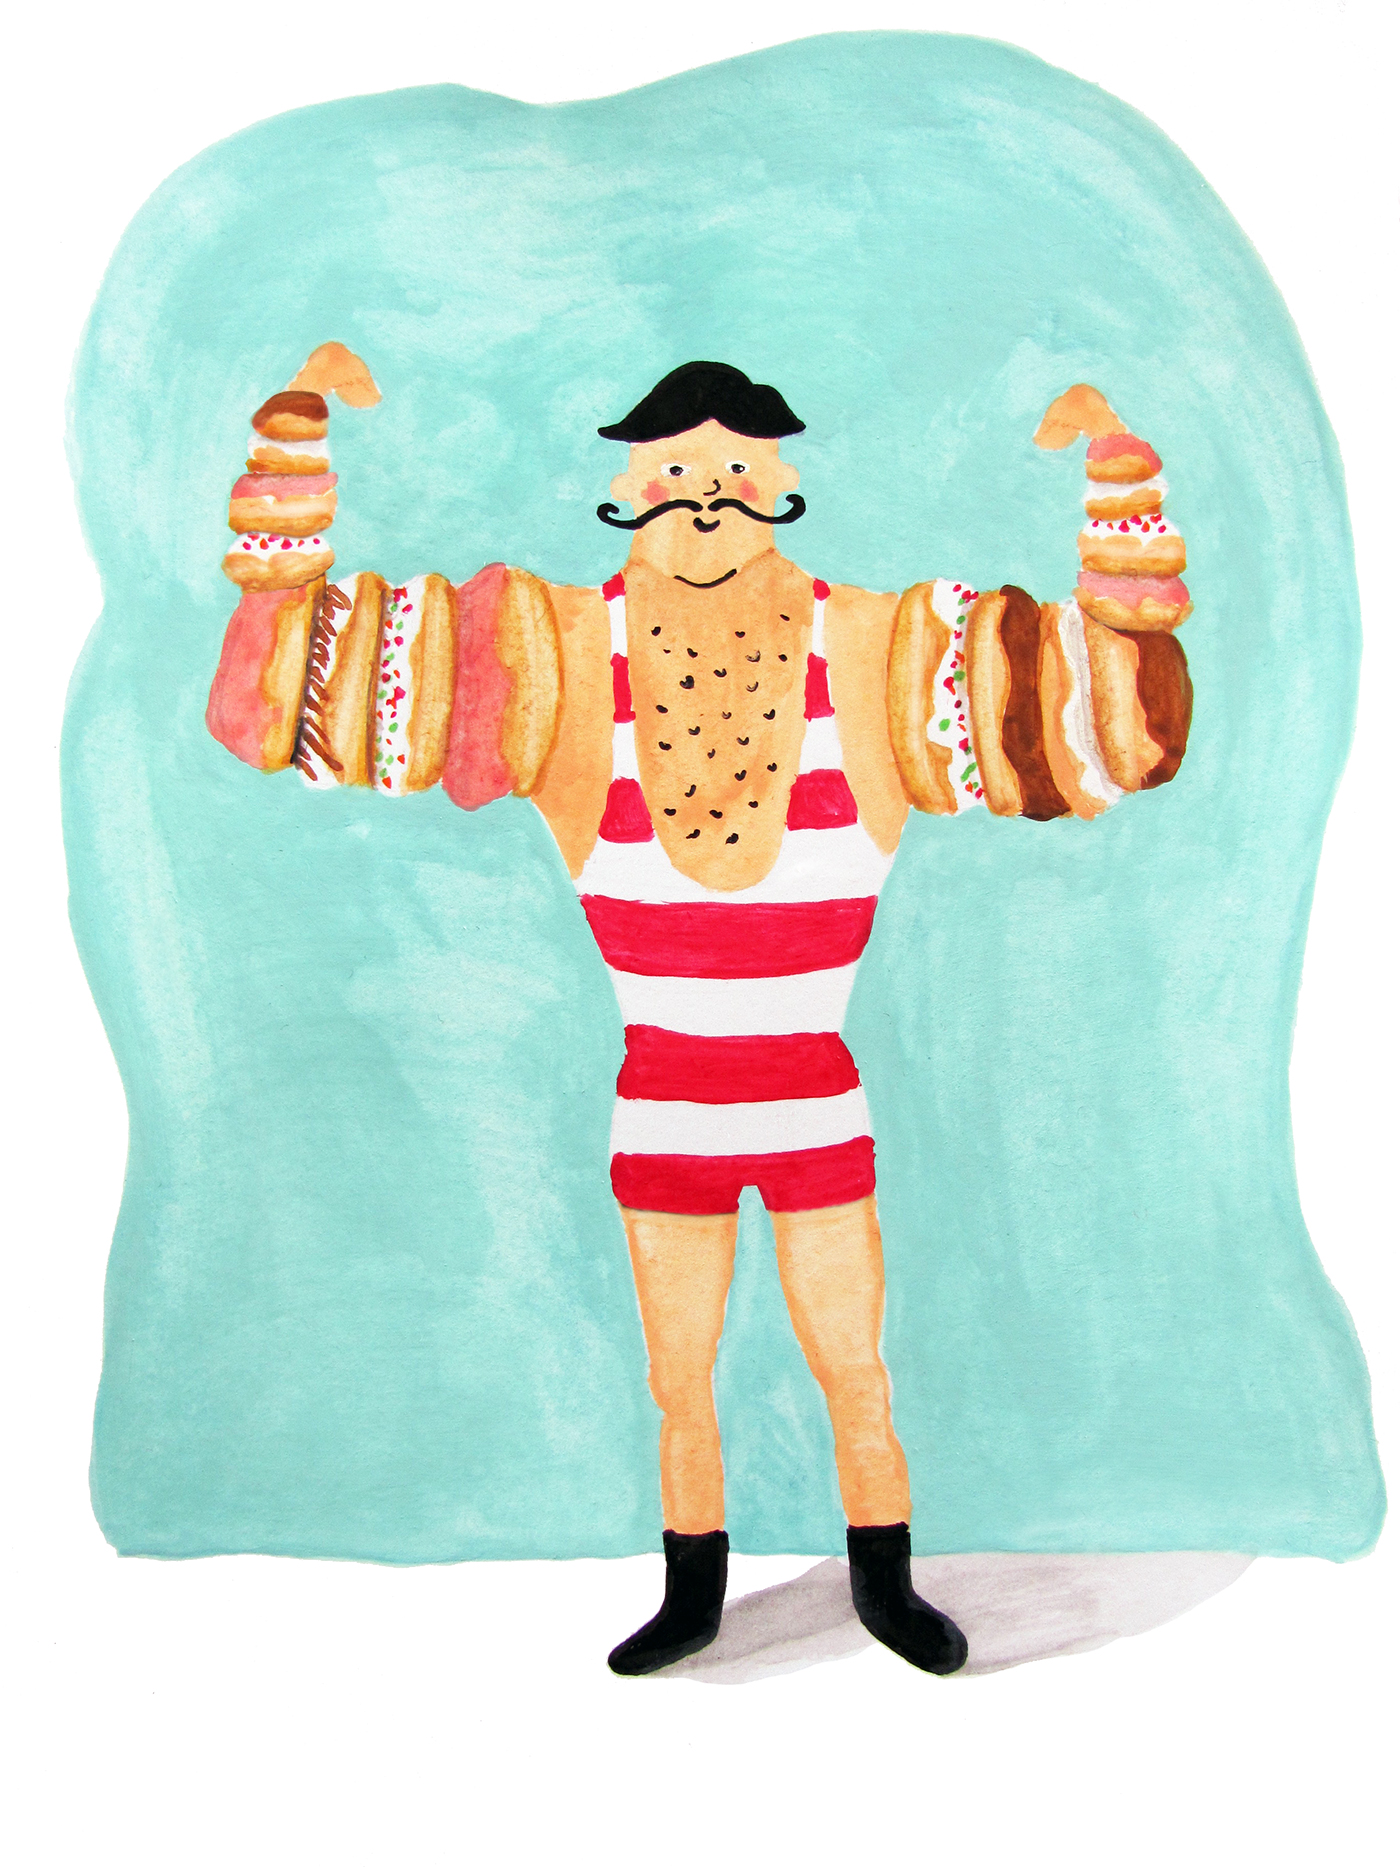 Donut Muscles  / watercolor / April 2016